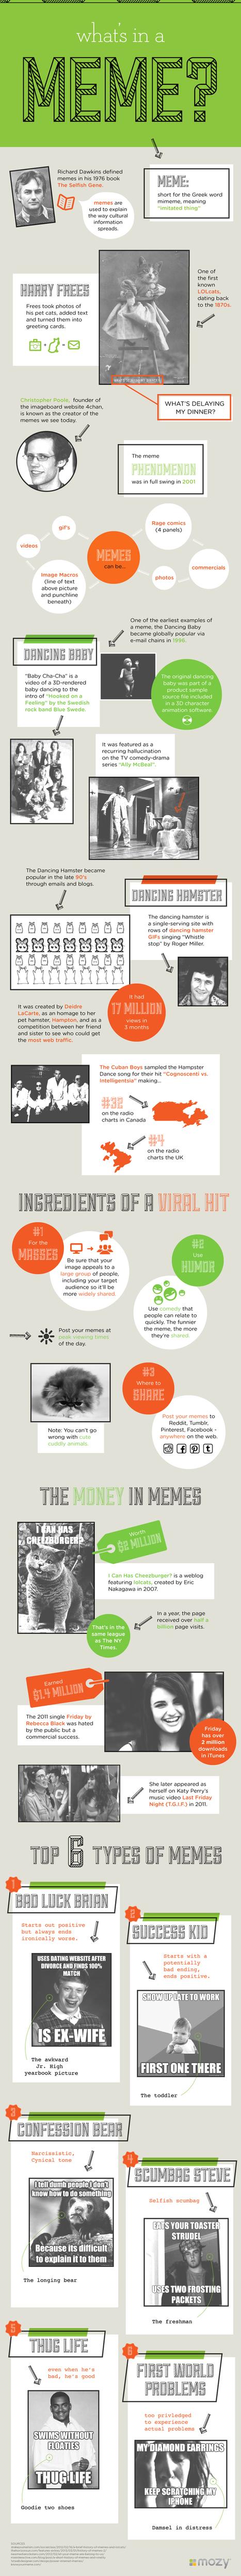 What's in a Meme? - an Infographic | Di tutto un pò... | Scoop.it